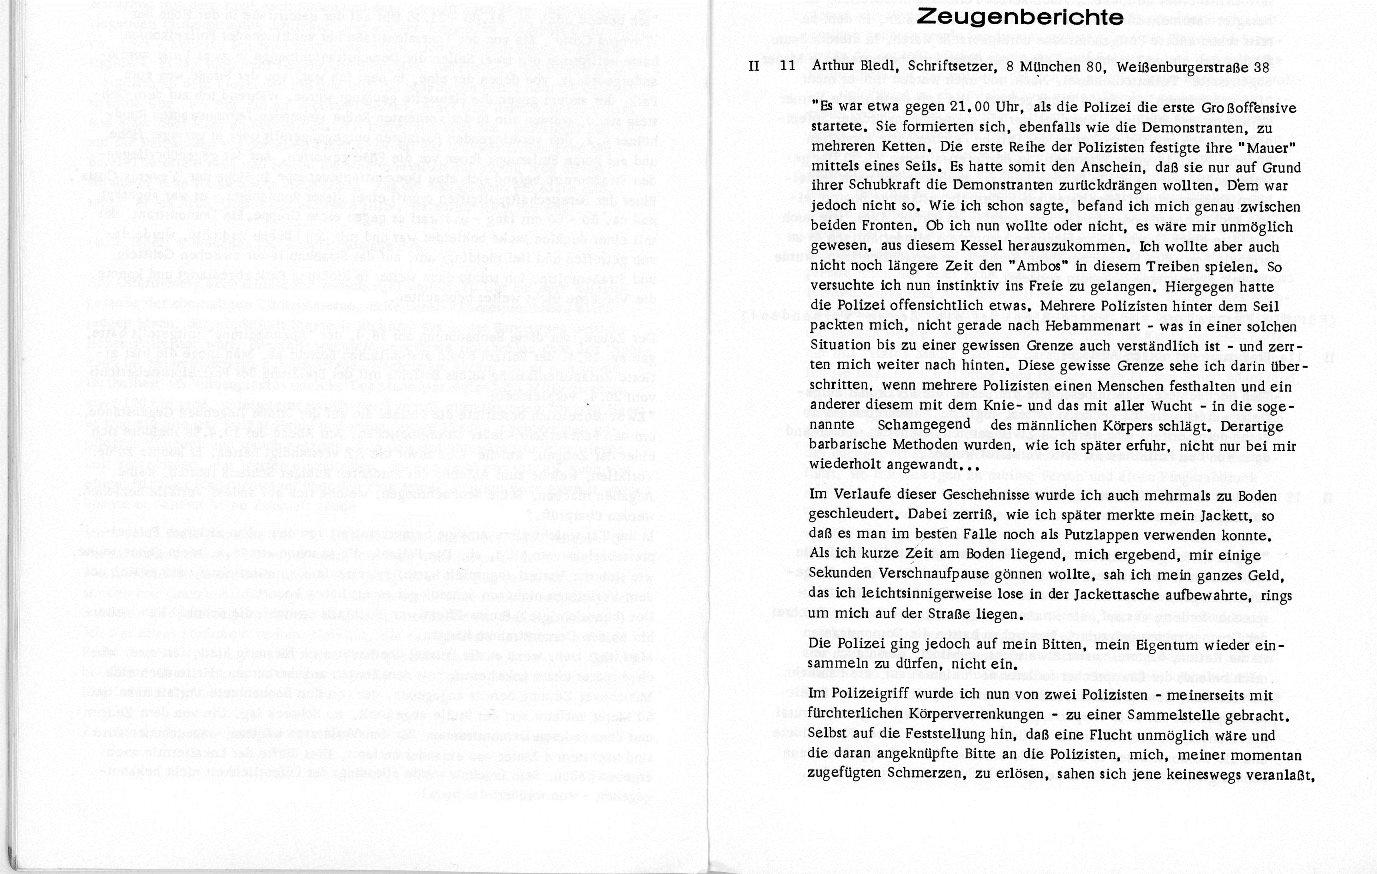 Muenchen_Doku_Osterdemonstrationen_1968_16